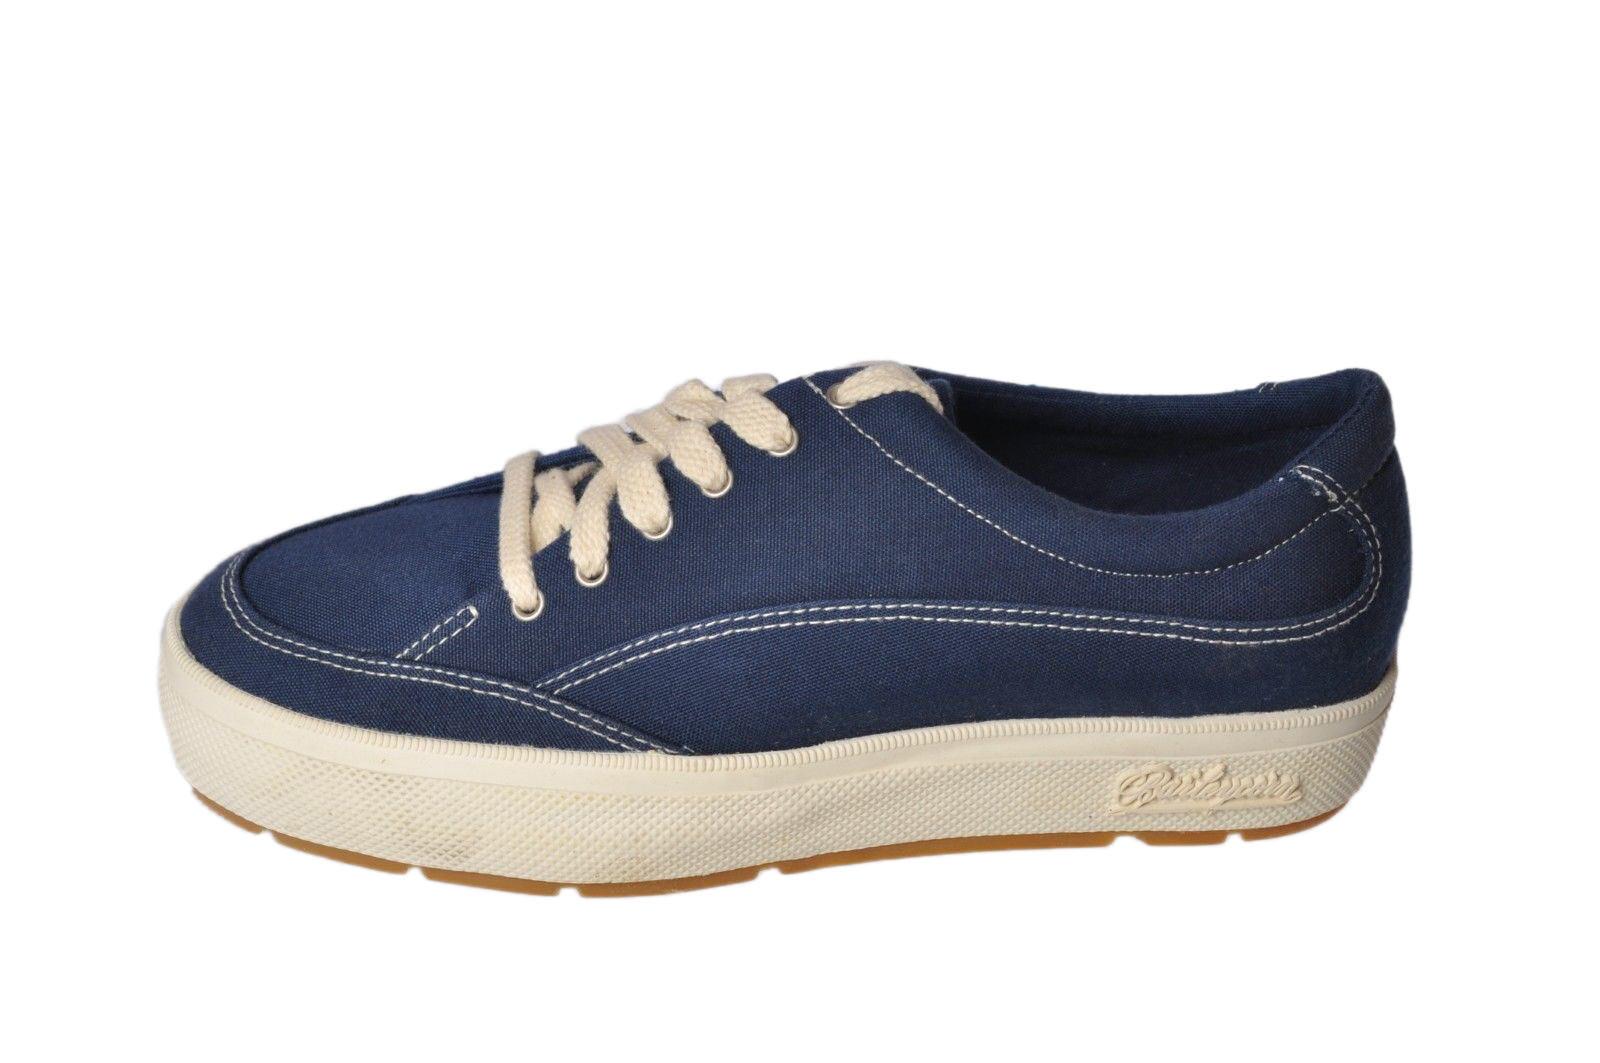 Barleycorn - Schuhe-Sneakers basse - Damenschuhe - Blu - 5144720C183714